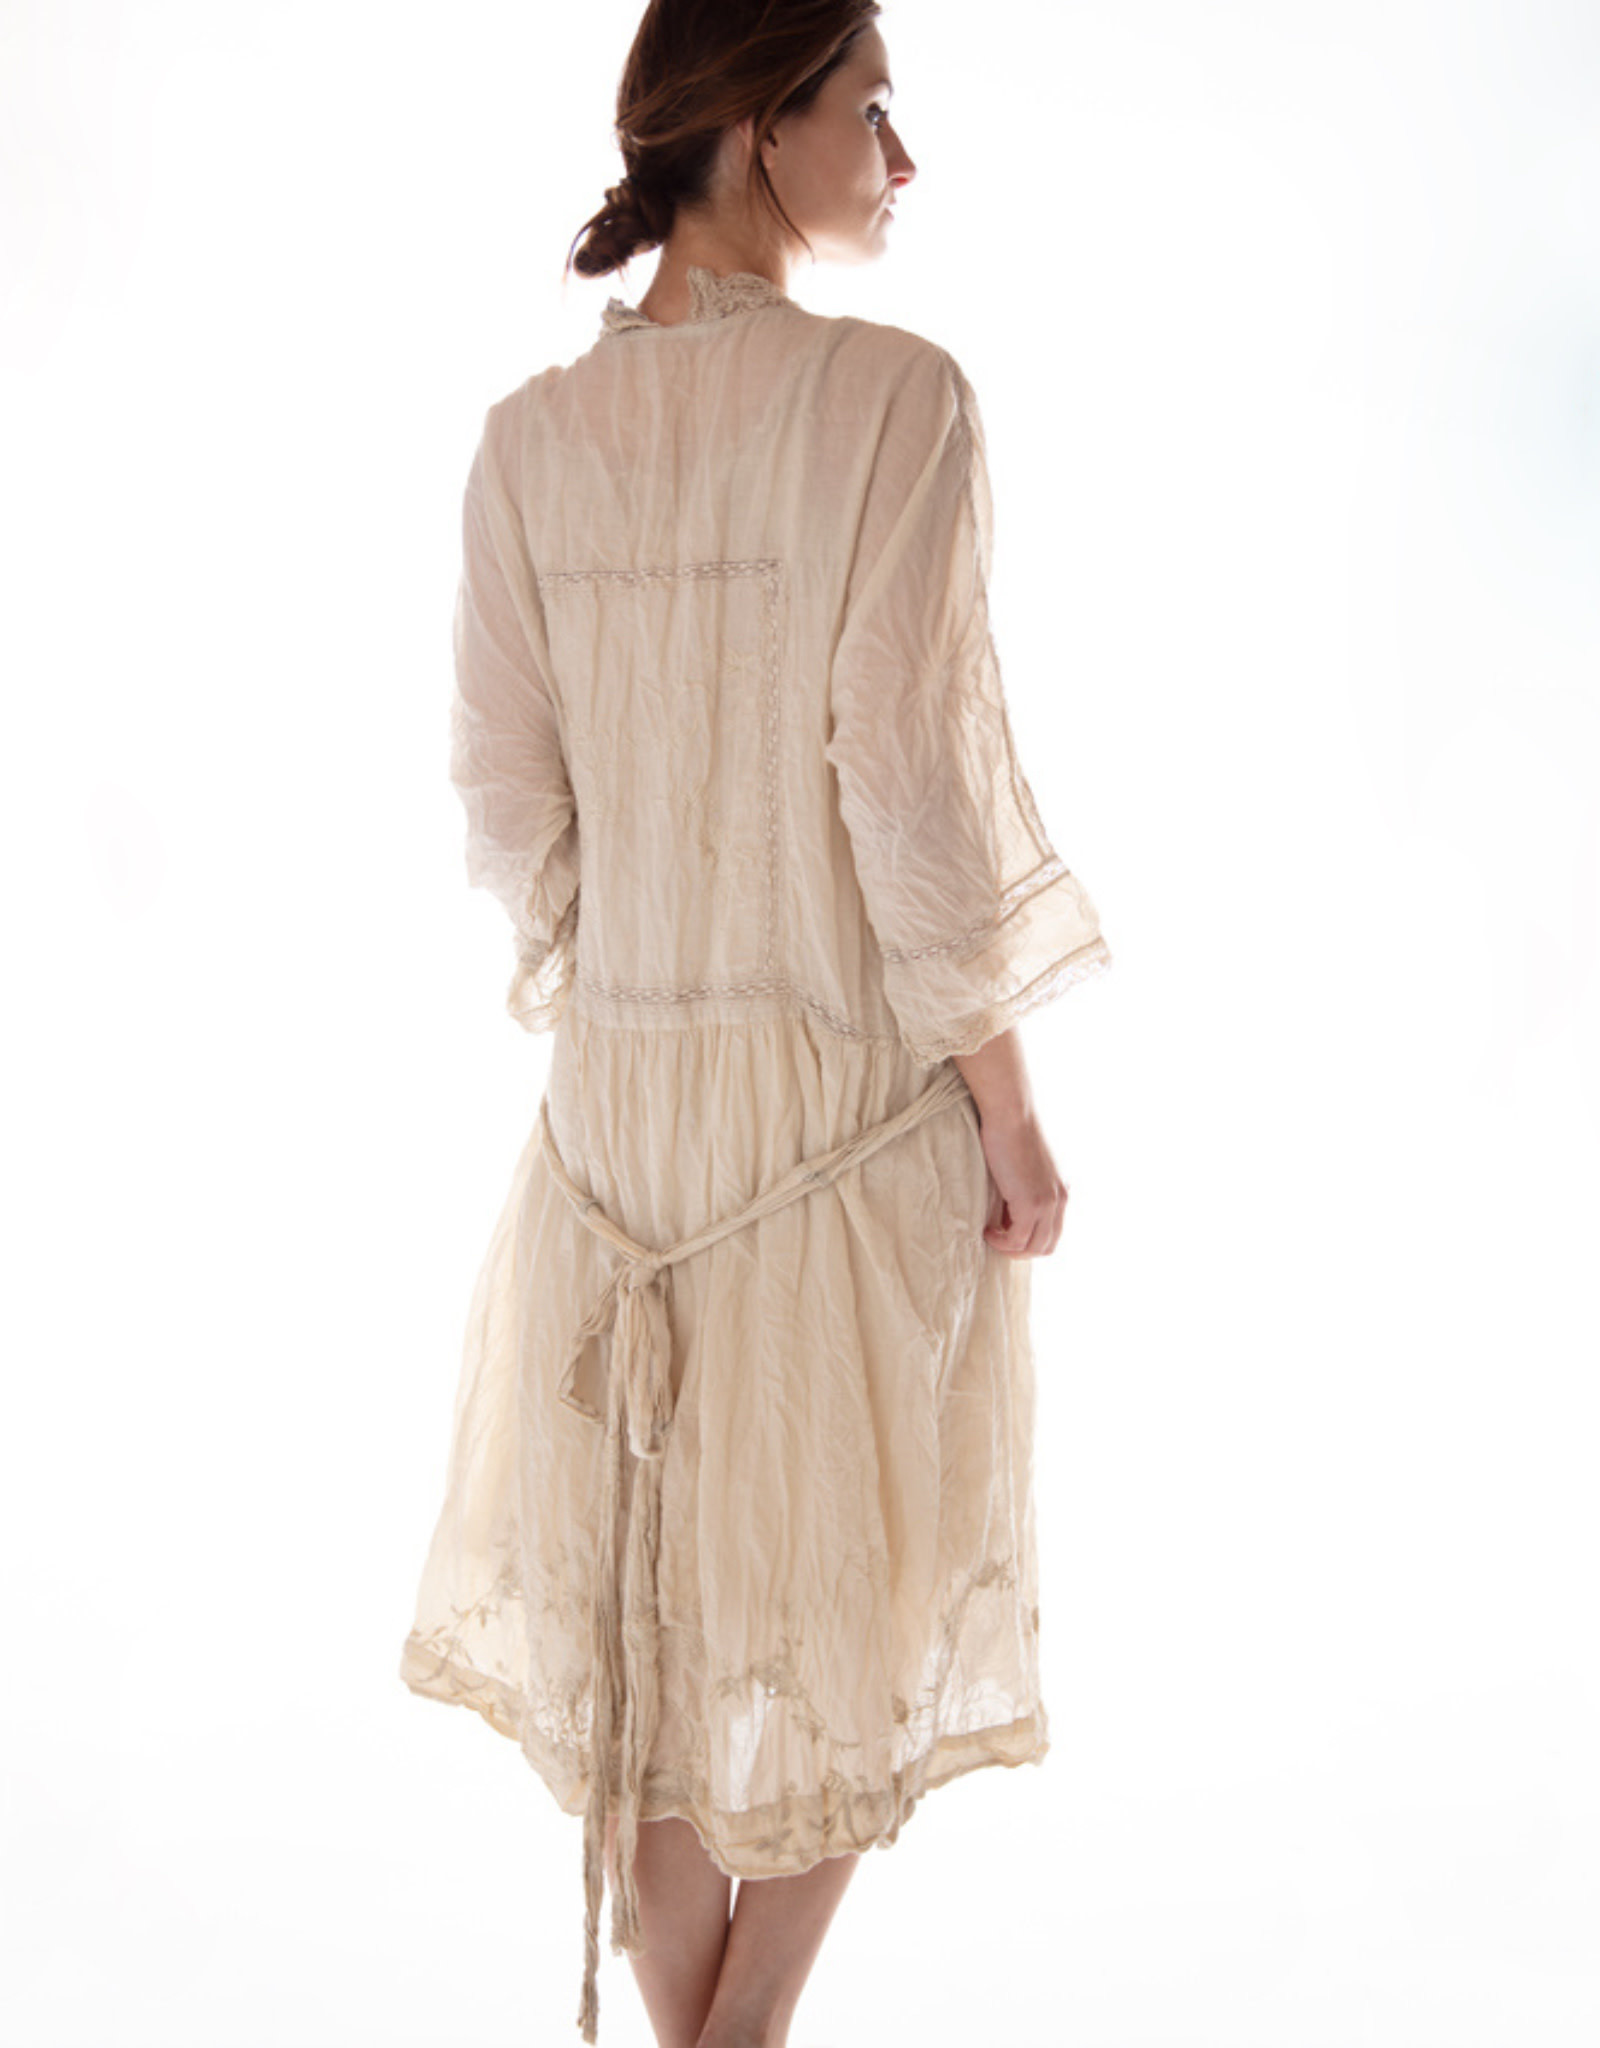 Magnolia Pearl Dress 567 (Moonlight, O/S)